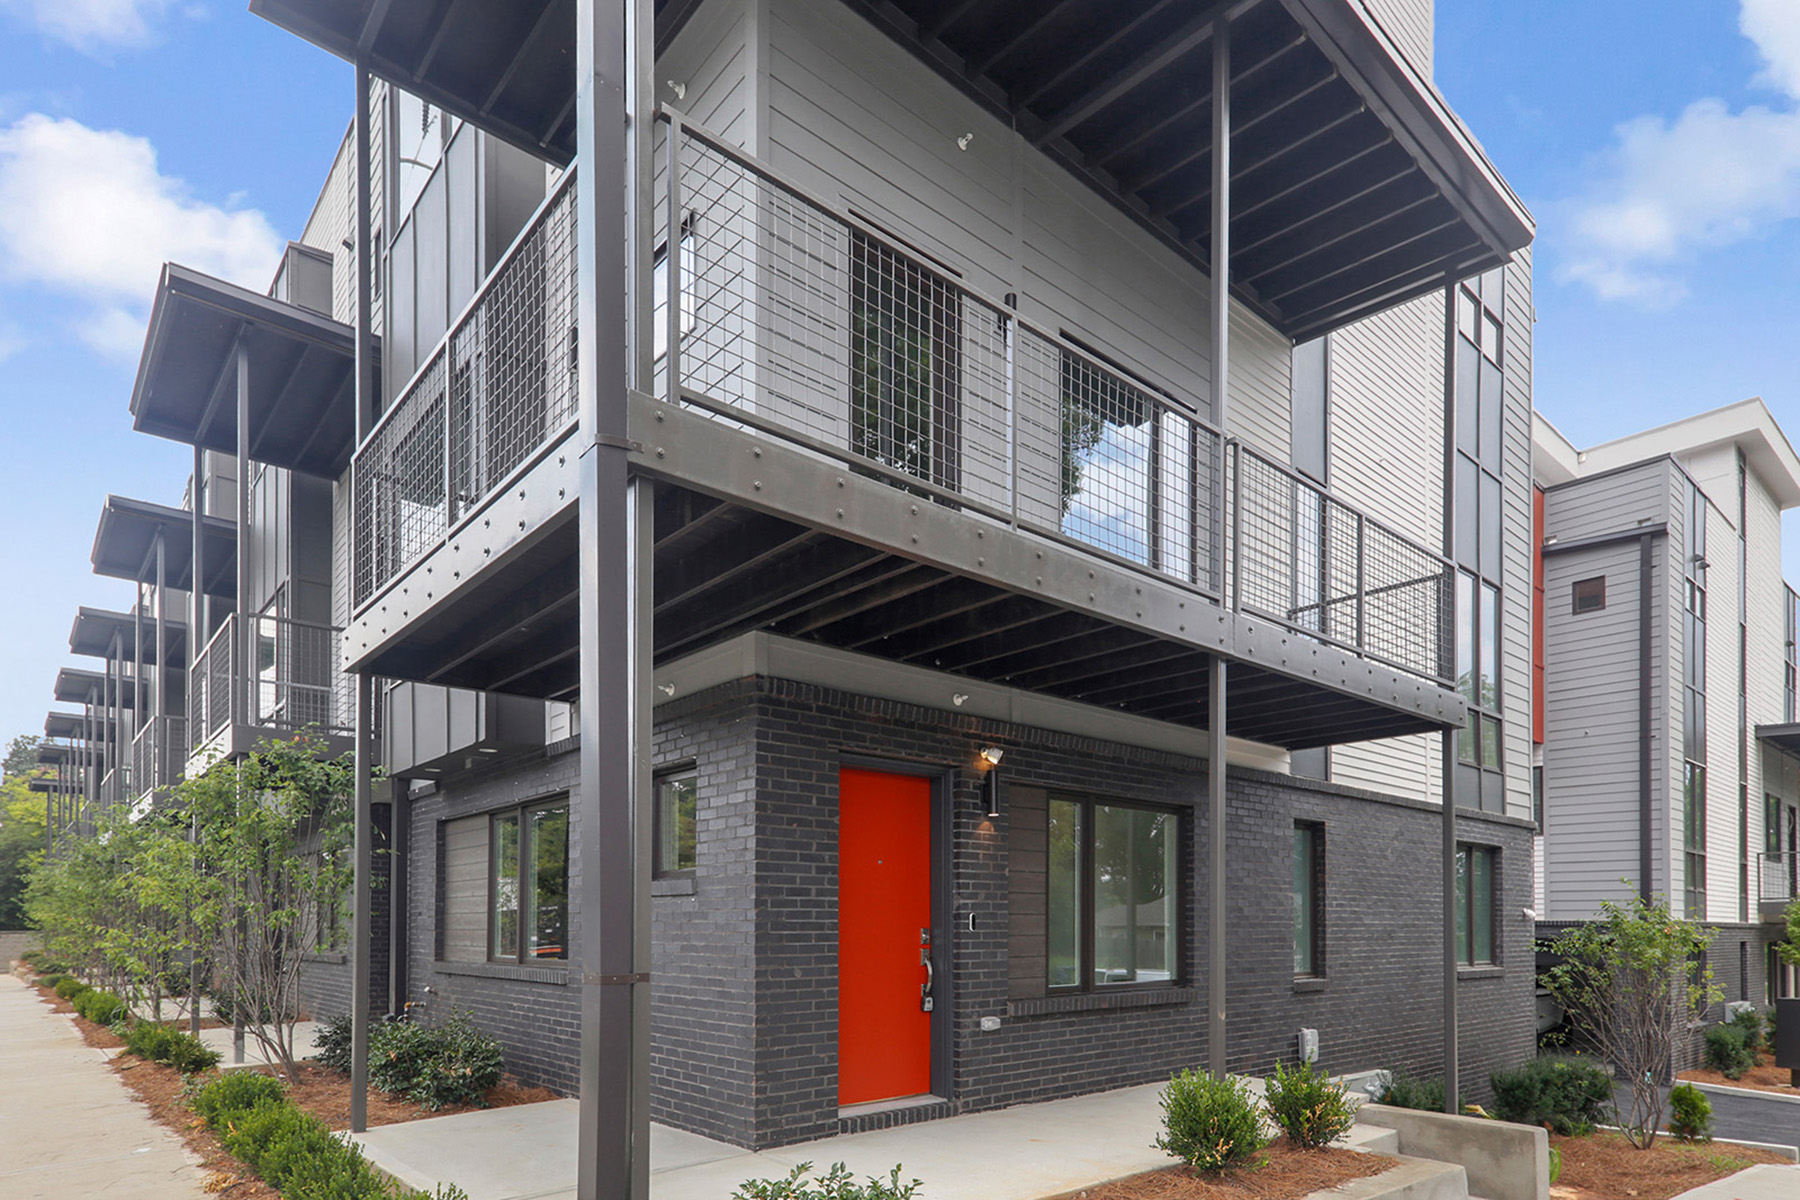 Madison Village Is A Community of 16 Artfully Designed Contemporary Townhomes 1145 Kirkwood Avenue SE No. 10, Atlanta, Georgia 30316 Stati Uniti